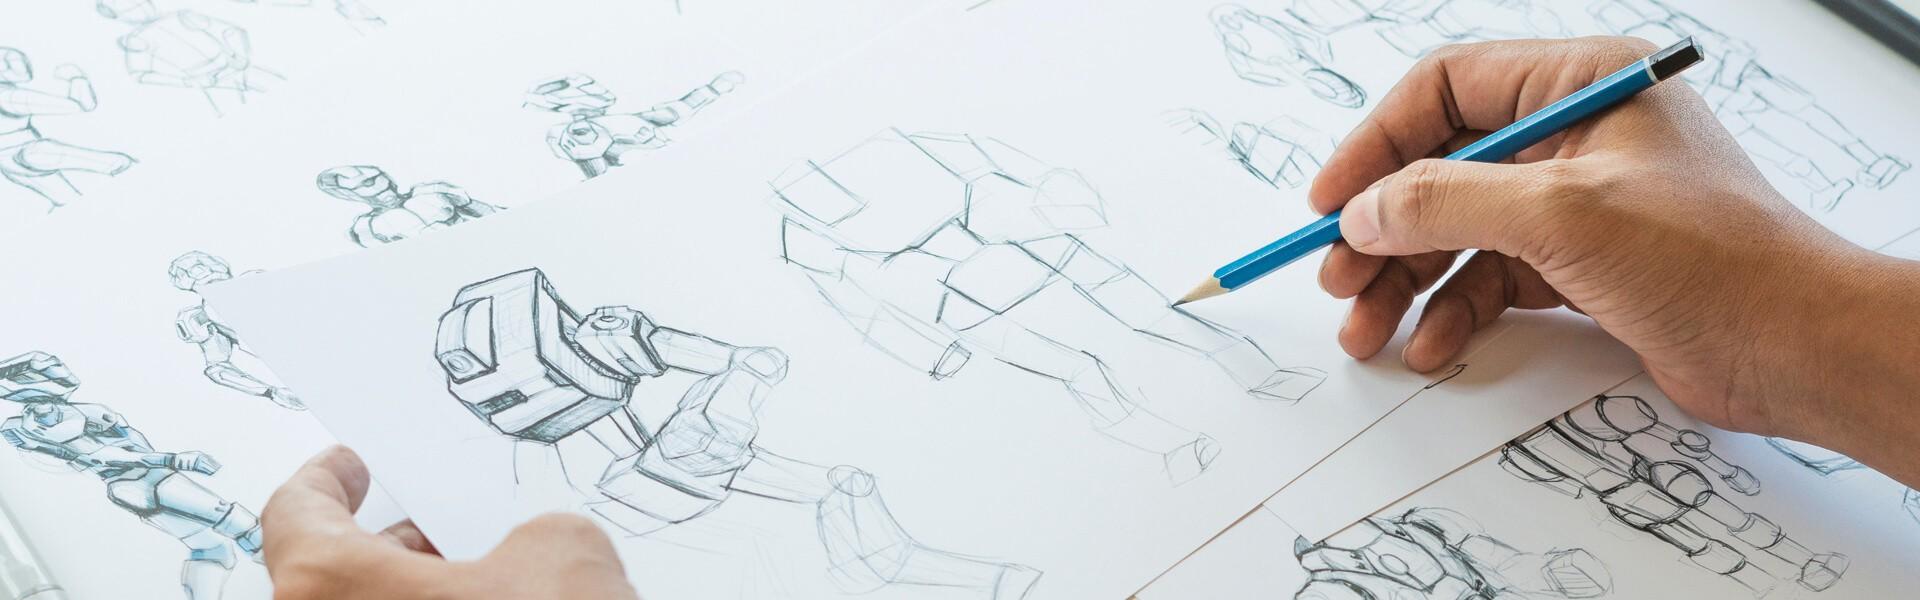 Animation & Motion Graphics Image